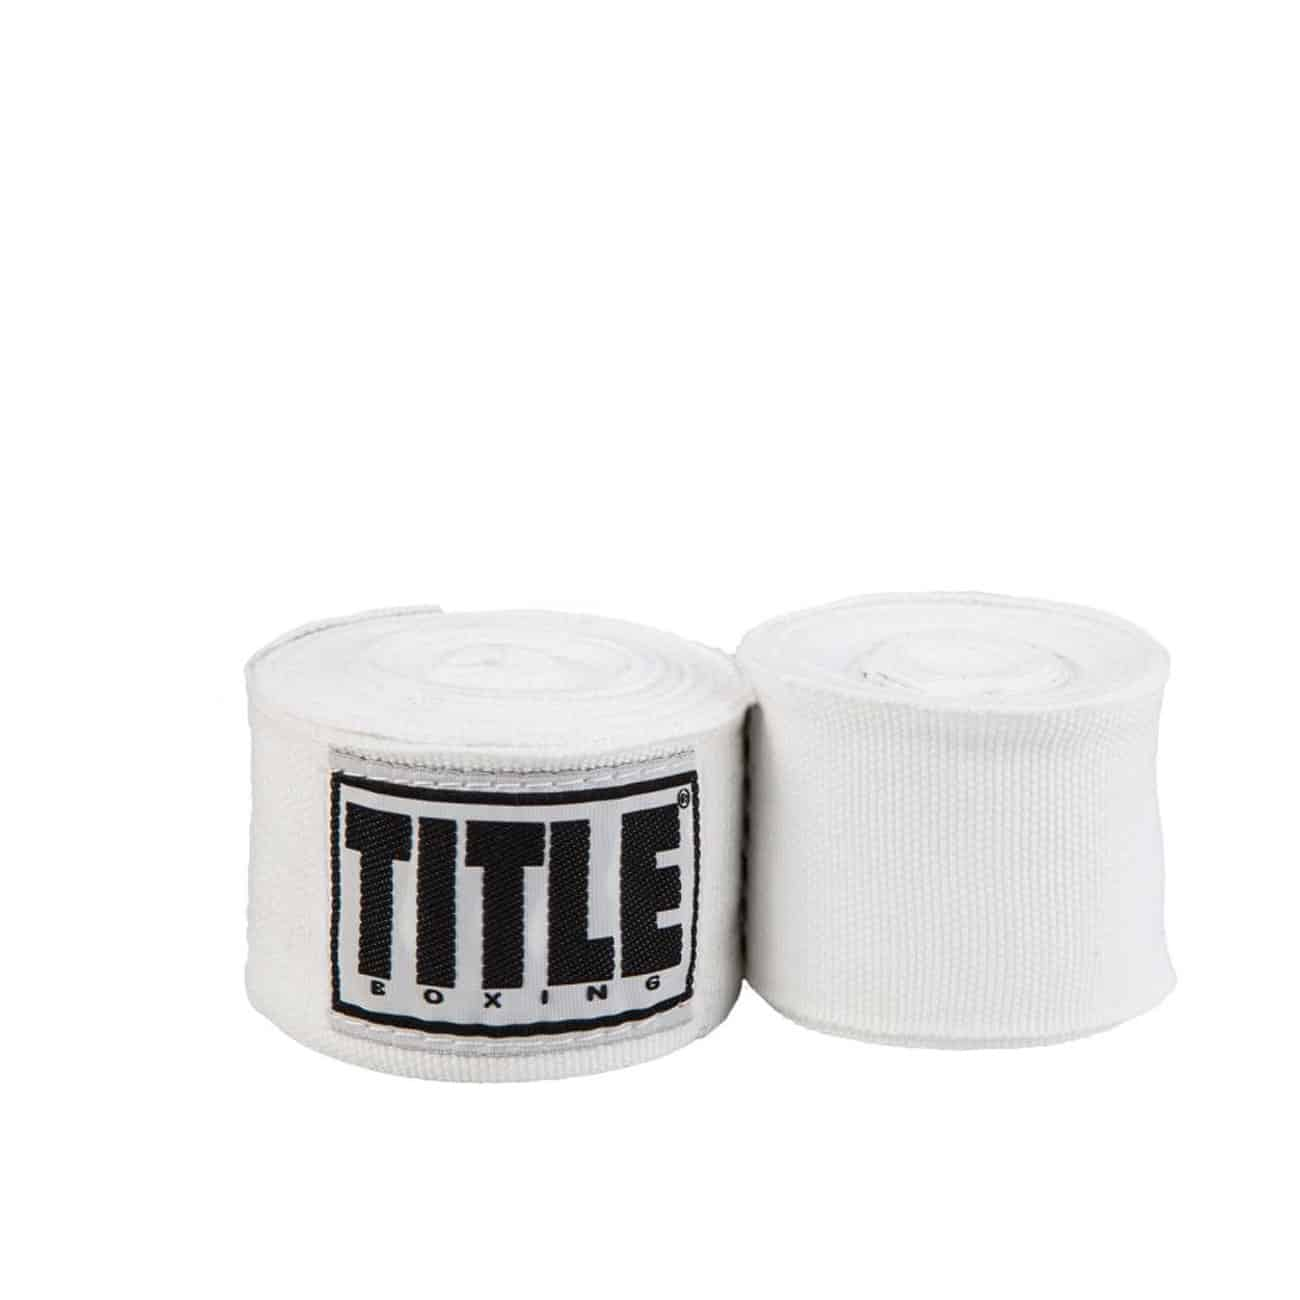 Vita handlindor från Title Boxing. 4,5m långa, 5cm breda